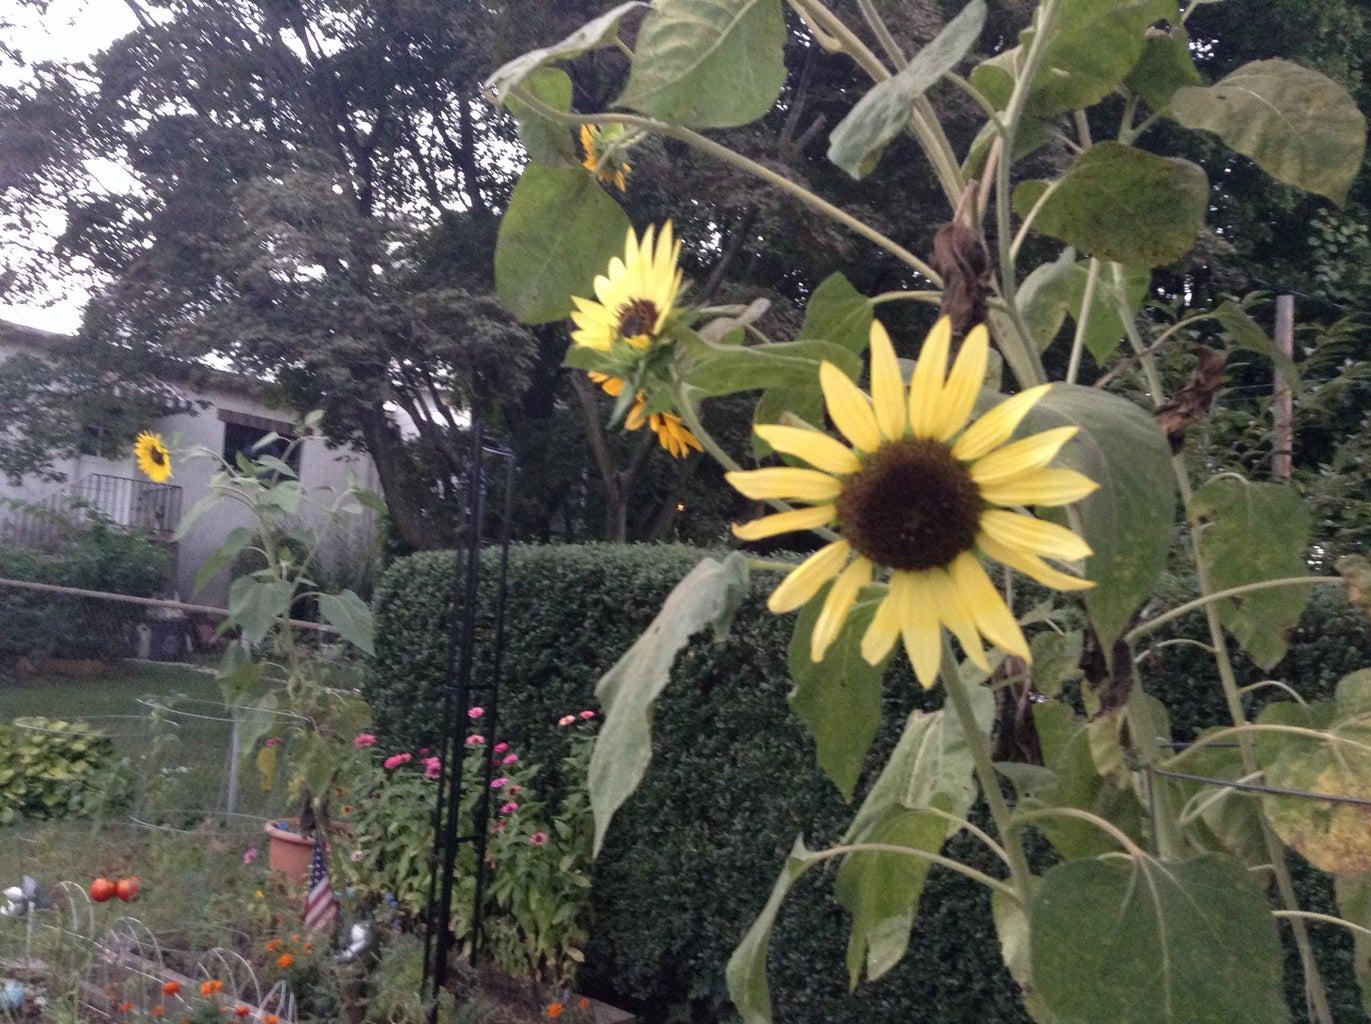 How to Harvest Ornamental Sunflower Seeds